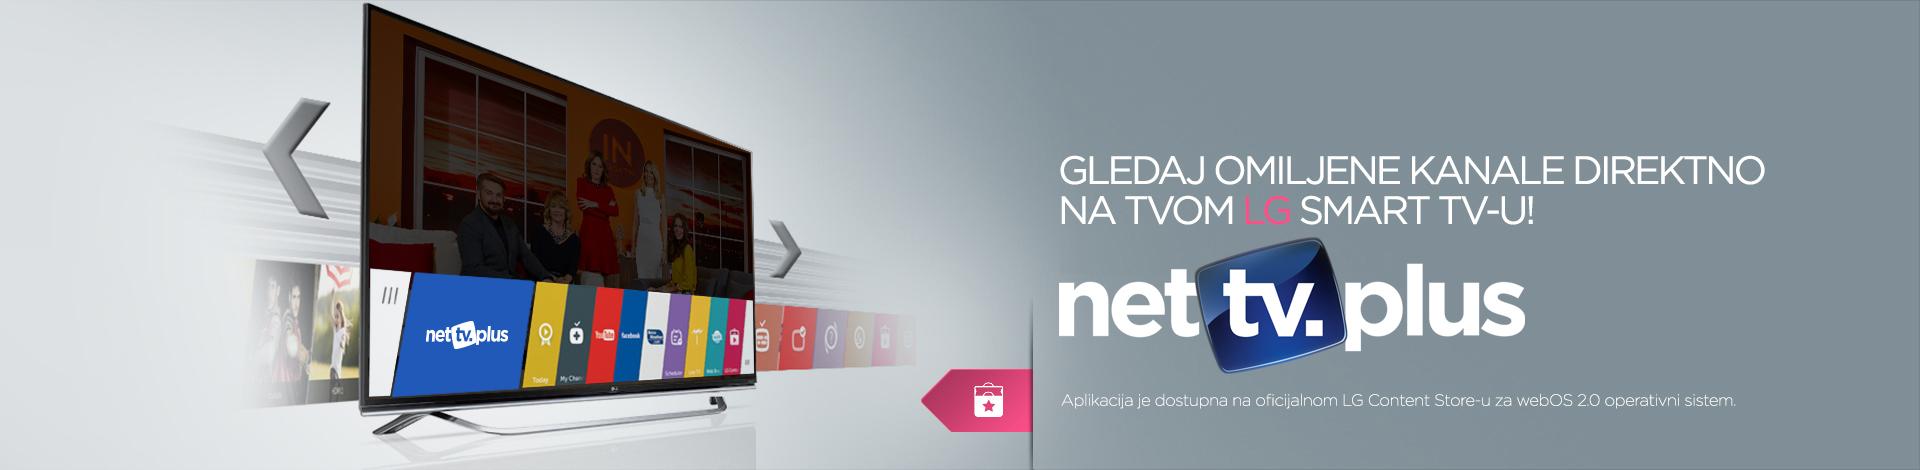 new-nettvplus-lg-webos-app